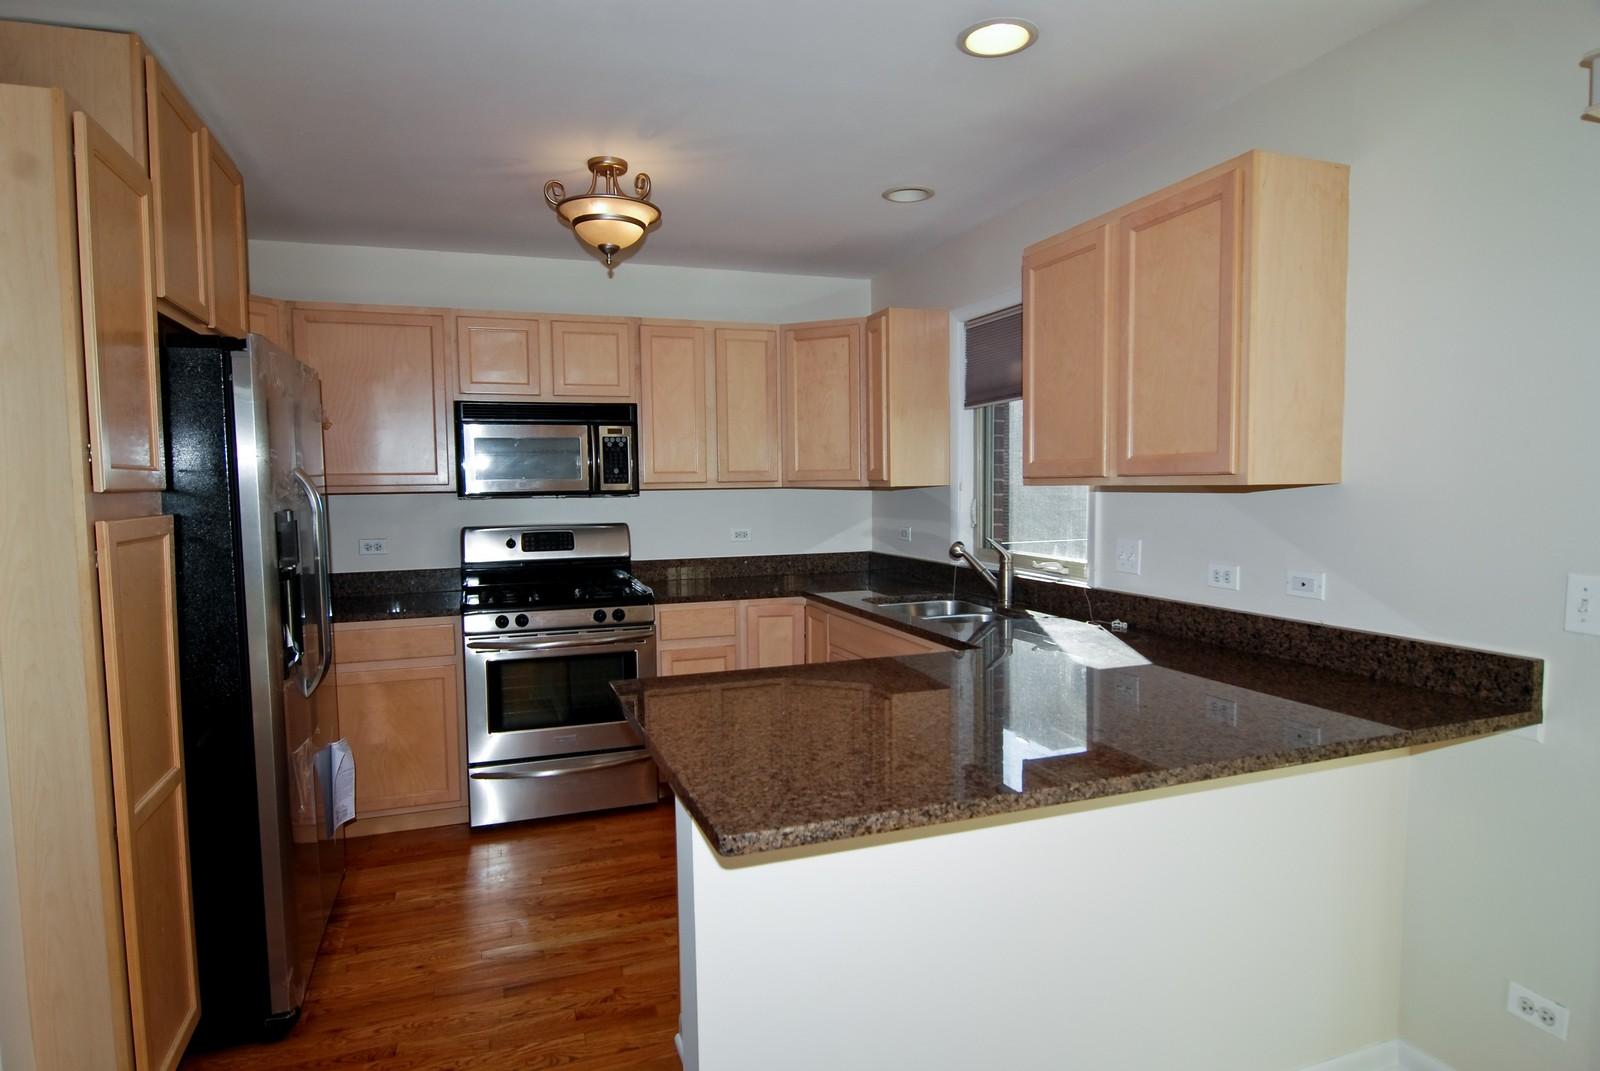 Real Estate Photography - 827 Dunlop, Forest Park, IL, 60130 - Kitchen